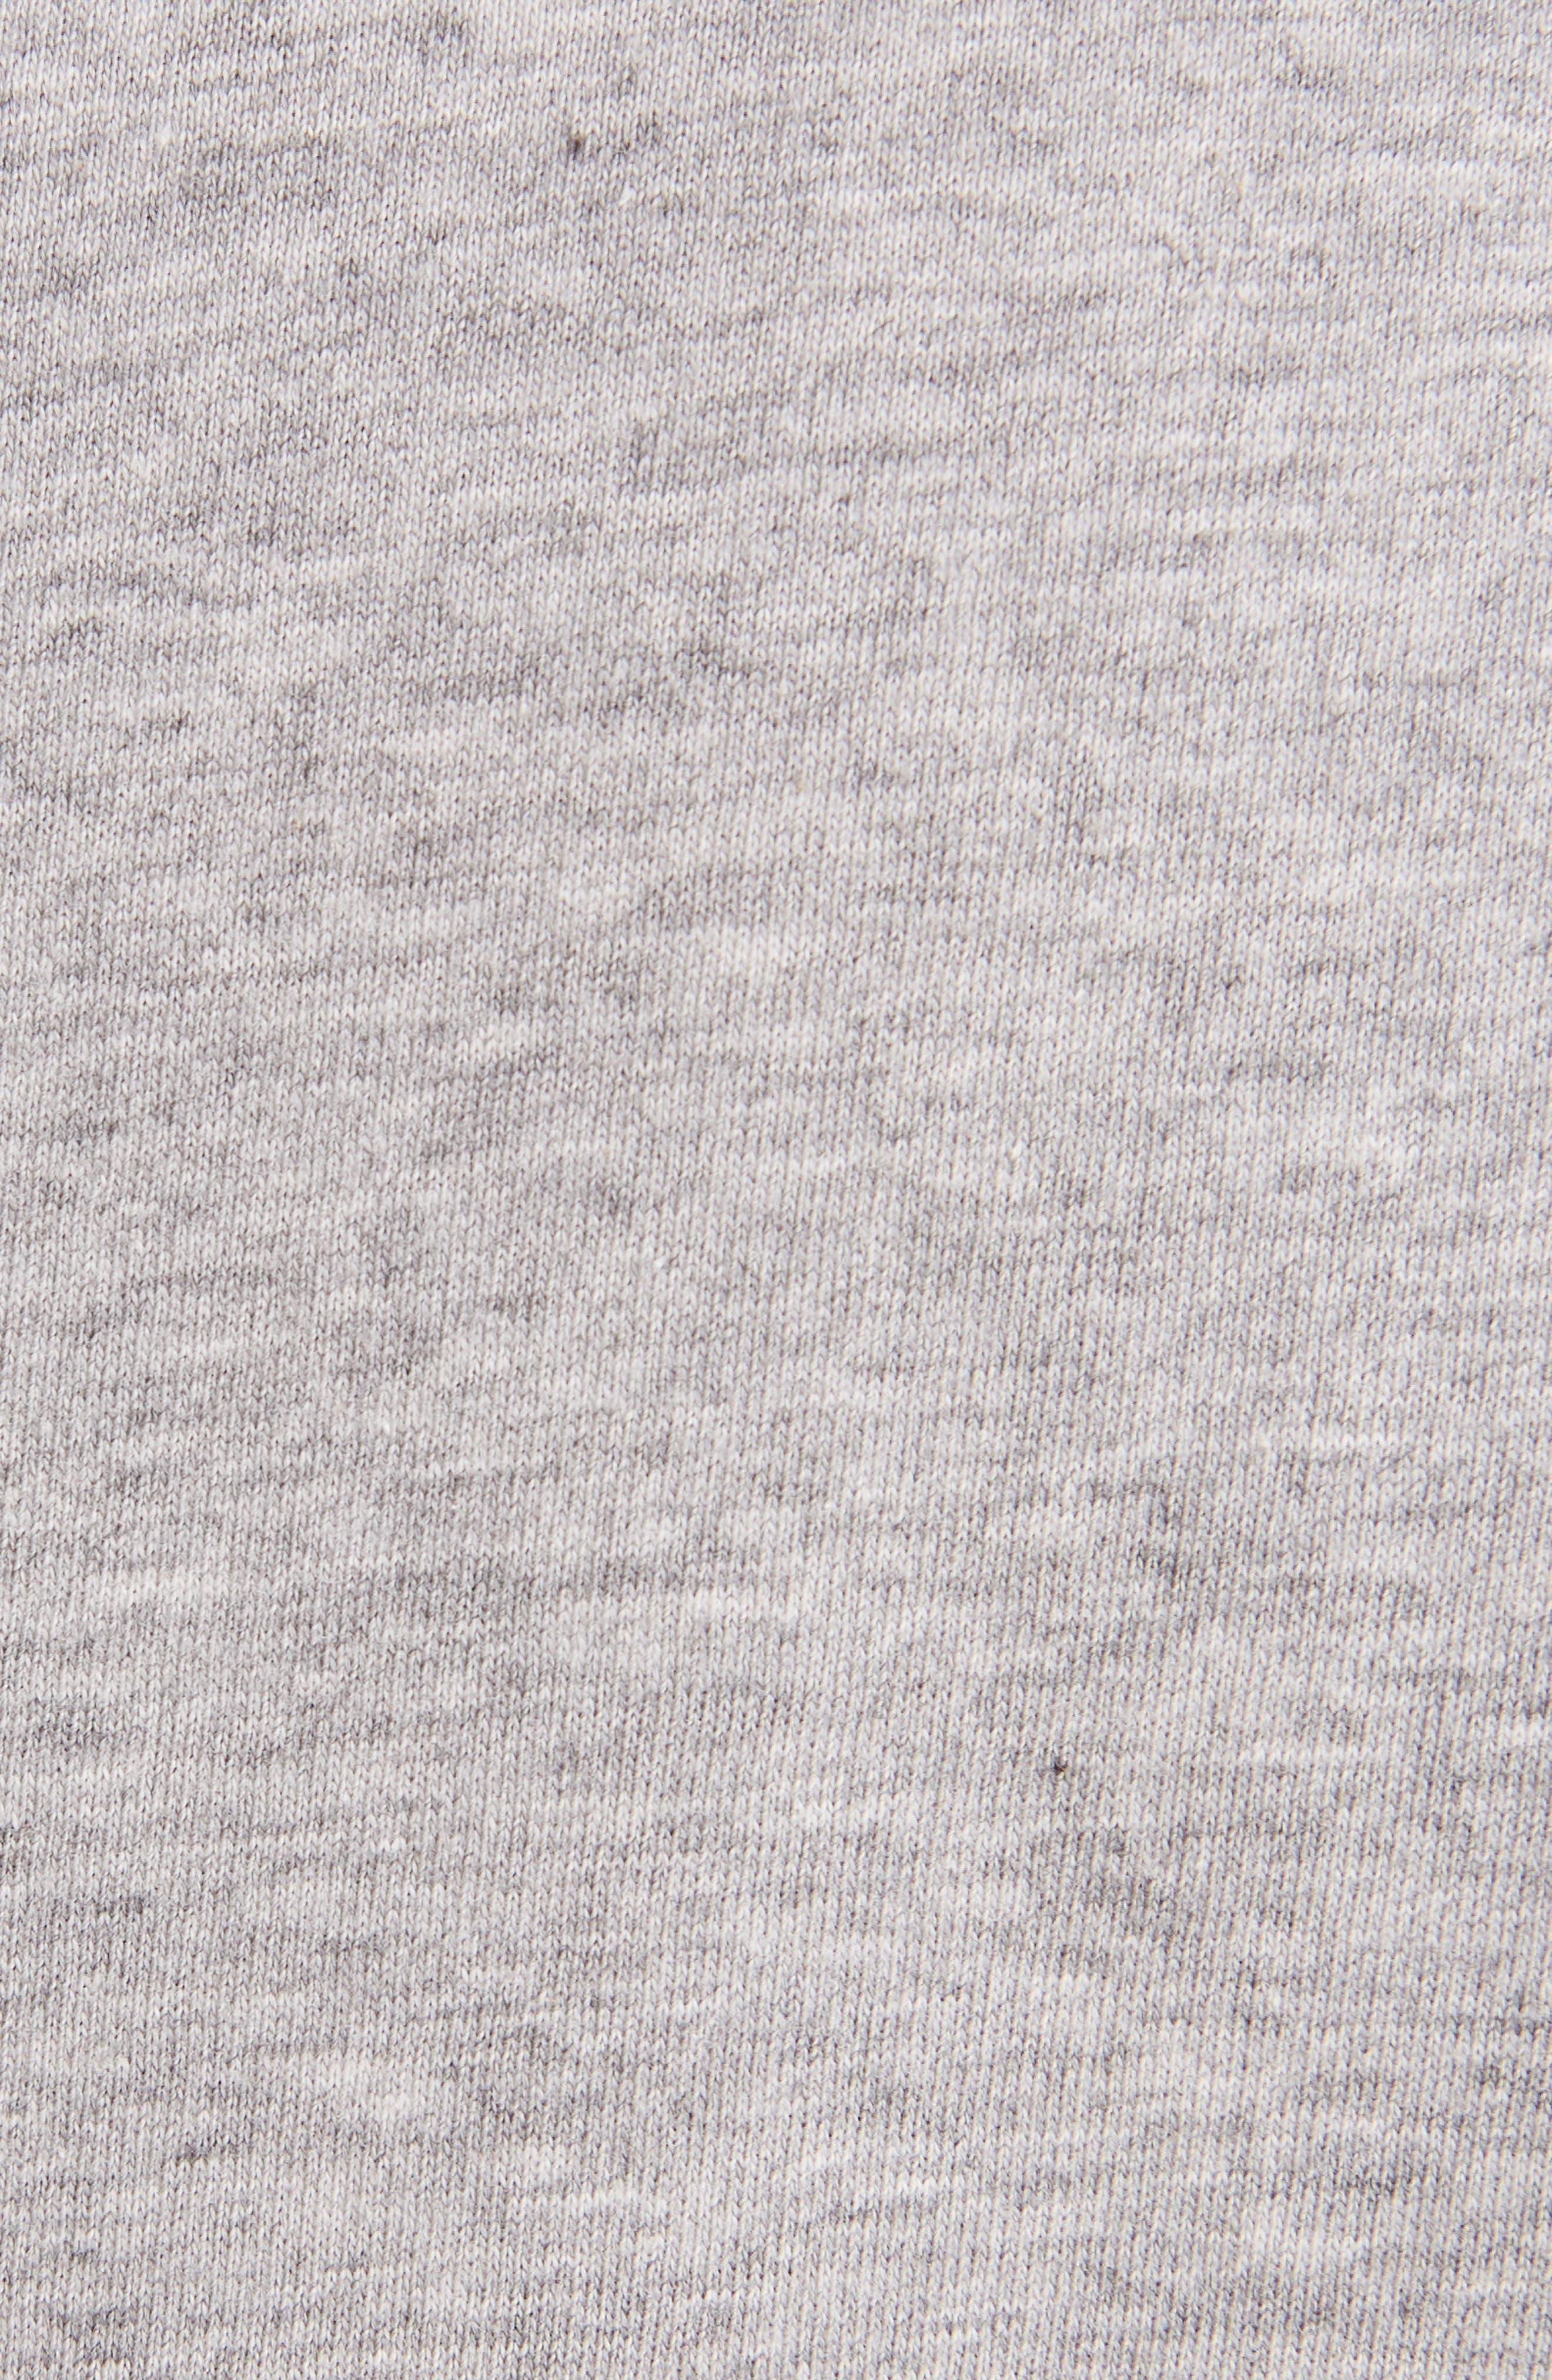 Alternate Image 5  - Givenchy Mesh Jersey Crewneck T-Shirt